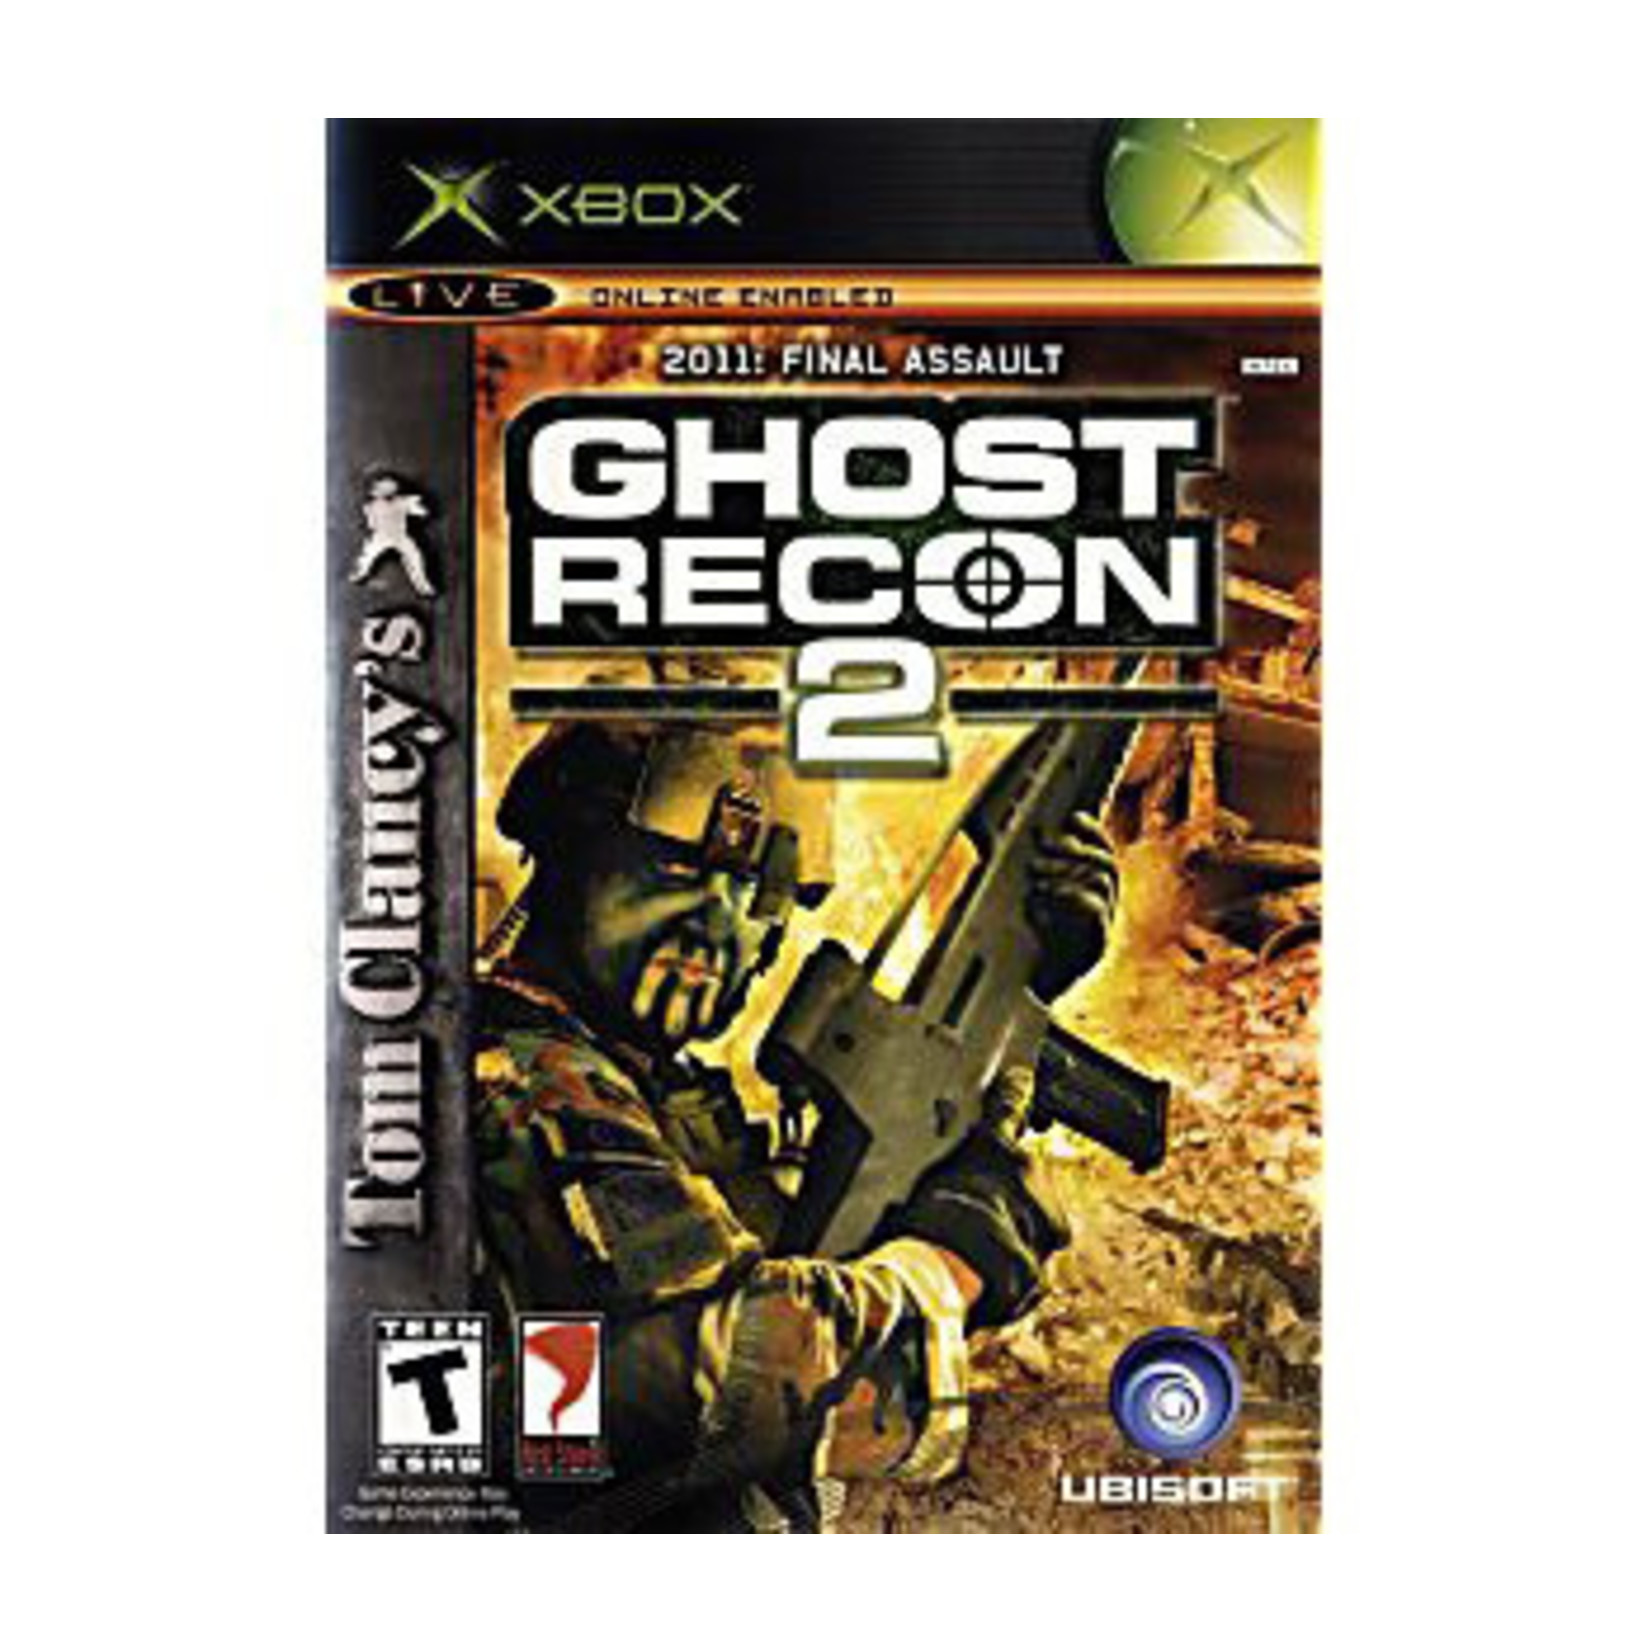 XBU-GHOST RECON 2